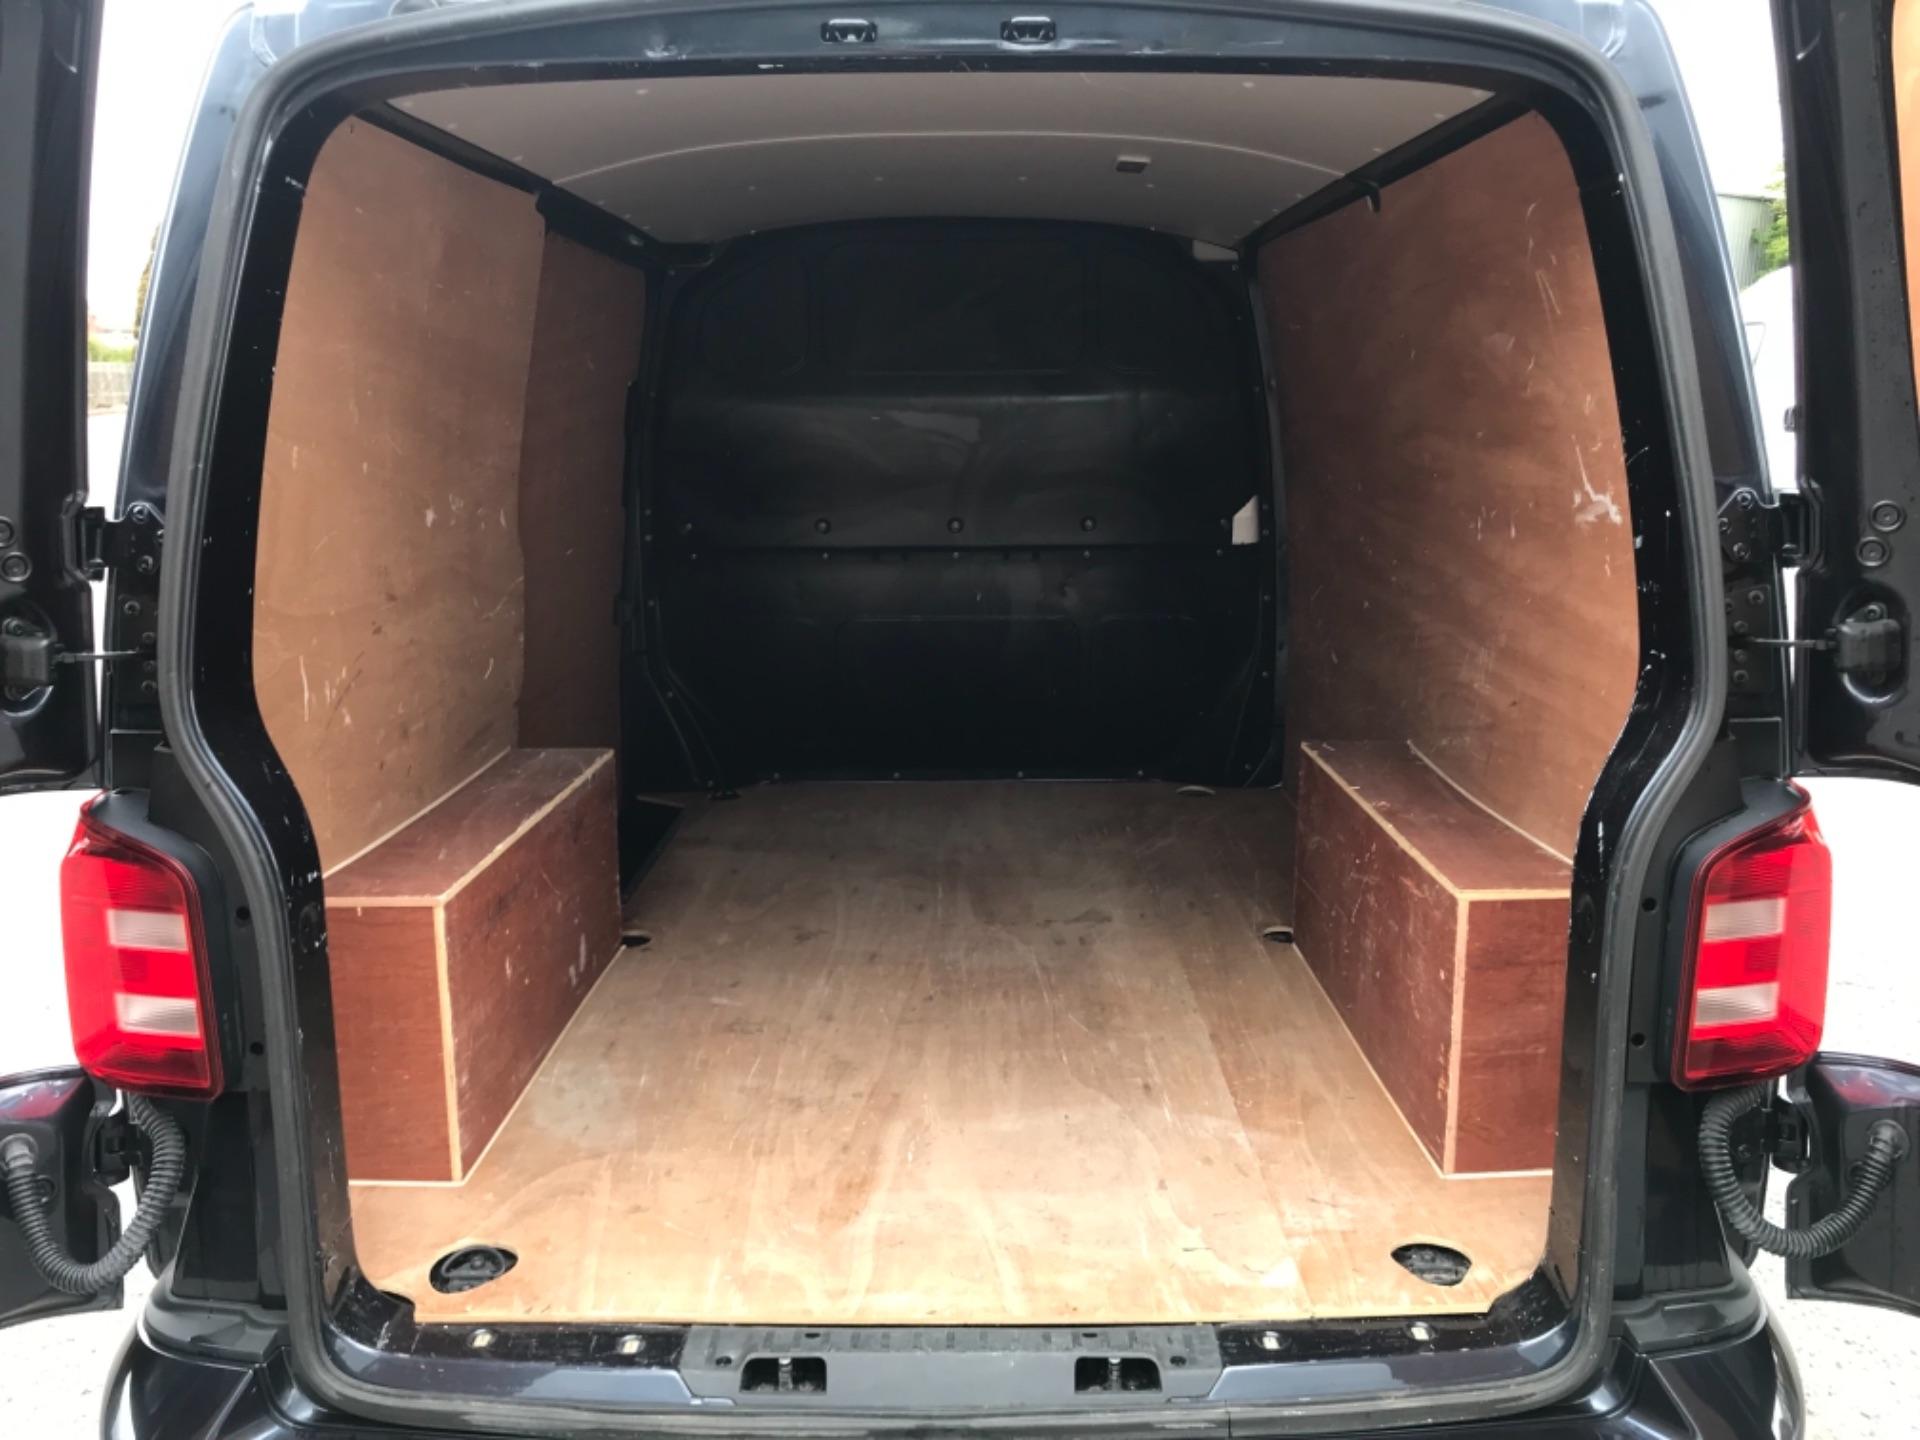 2019 Volkswagen Transporter 2.0 Tdi Bmt 150 Highline Van EURO 6 (GX69ZSN) Image 34